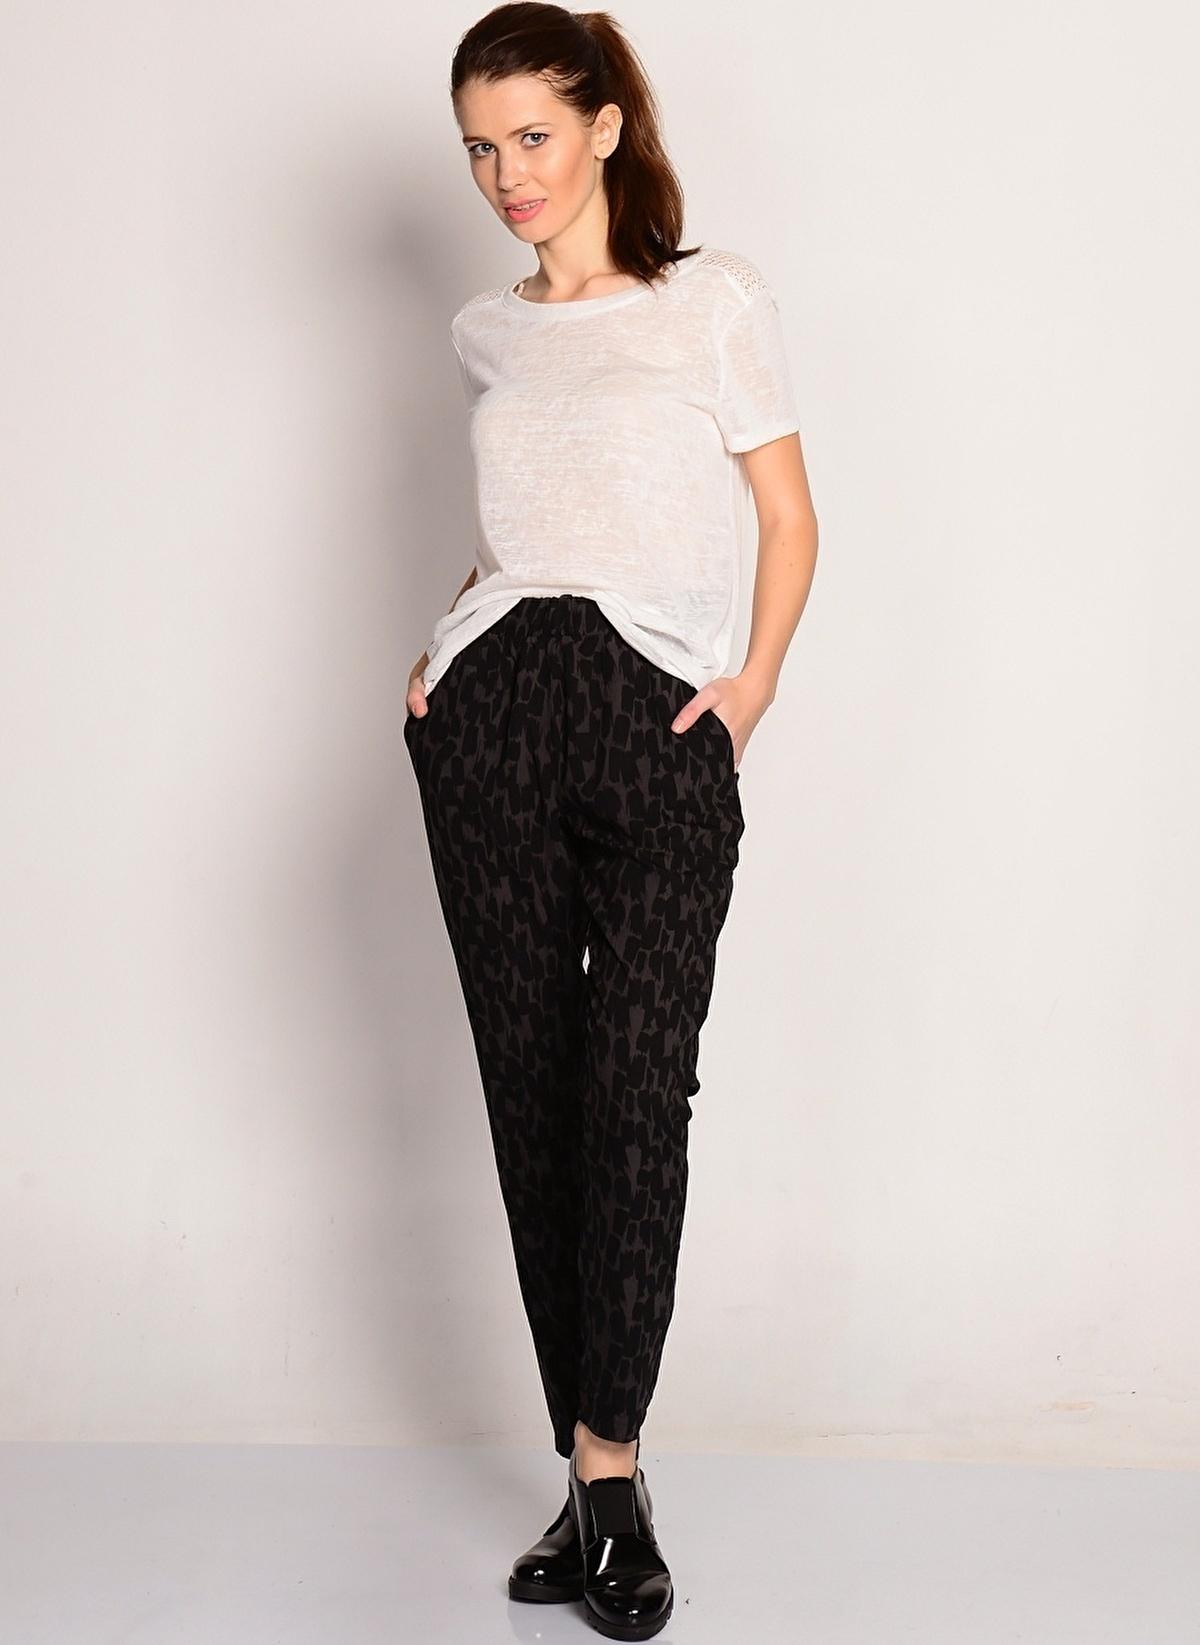 Ichi Pantolon Kadın – Trend – X – Dokuma – Pantolon – 59.99 TL